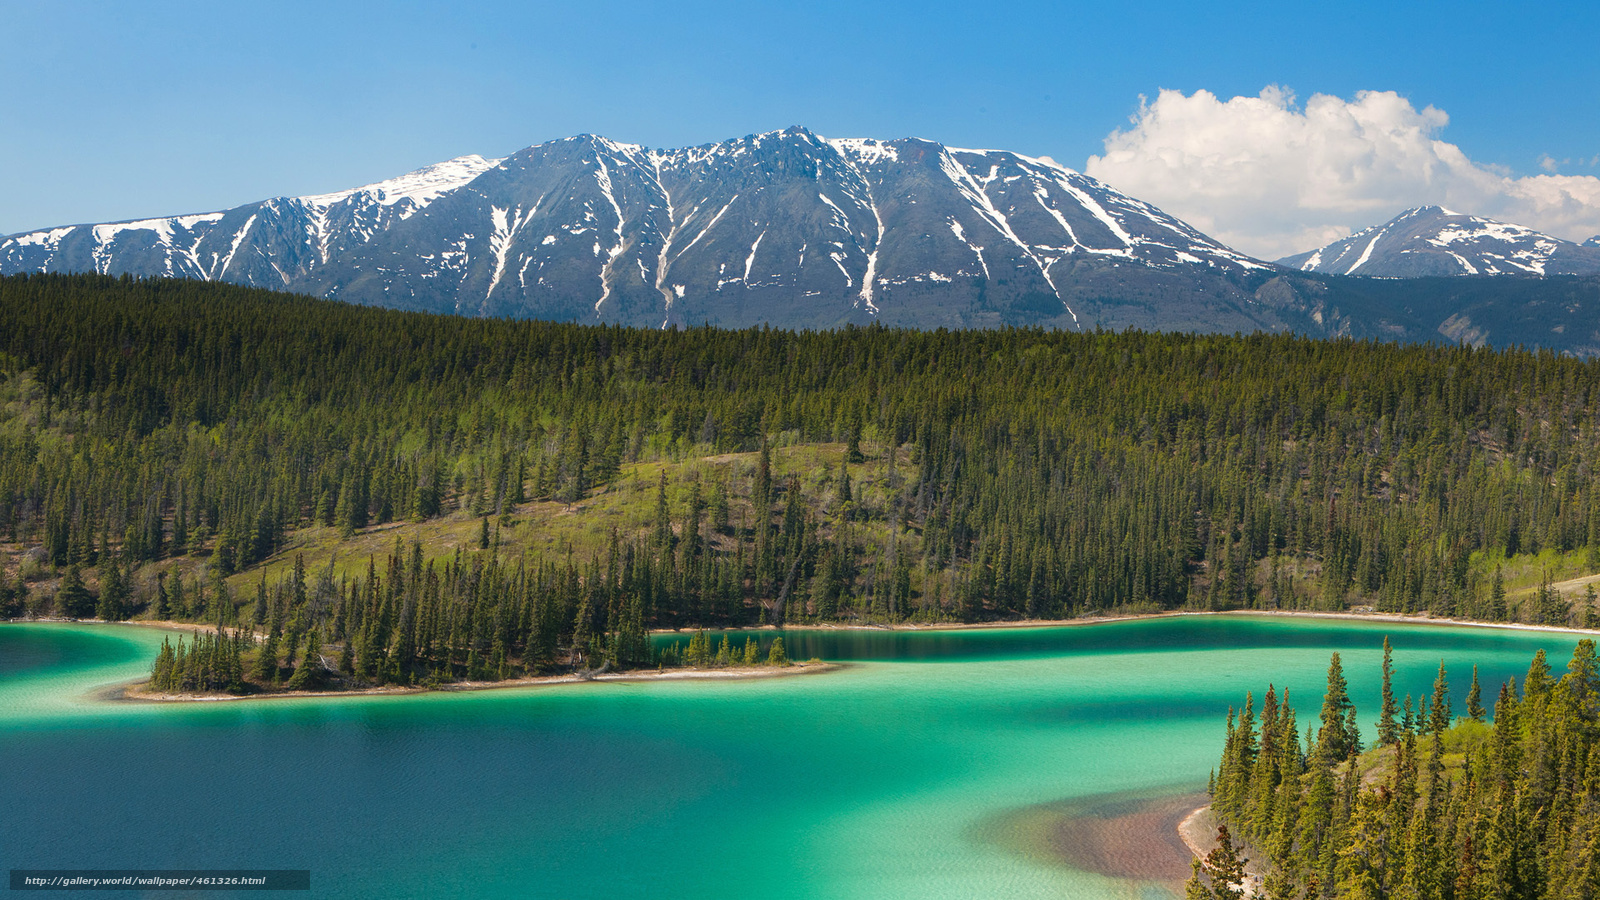 scaricare gli sfondi alaska - photo #4